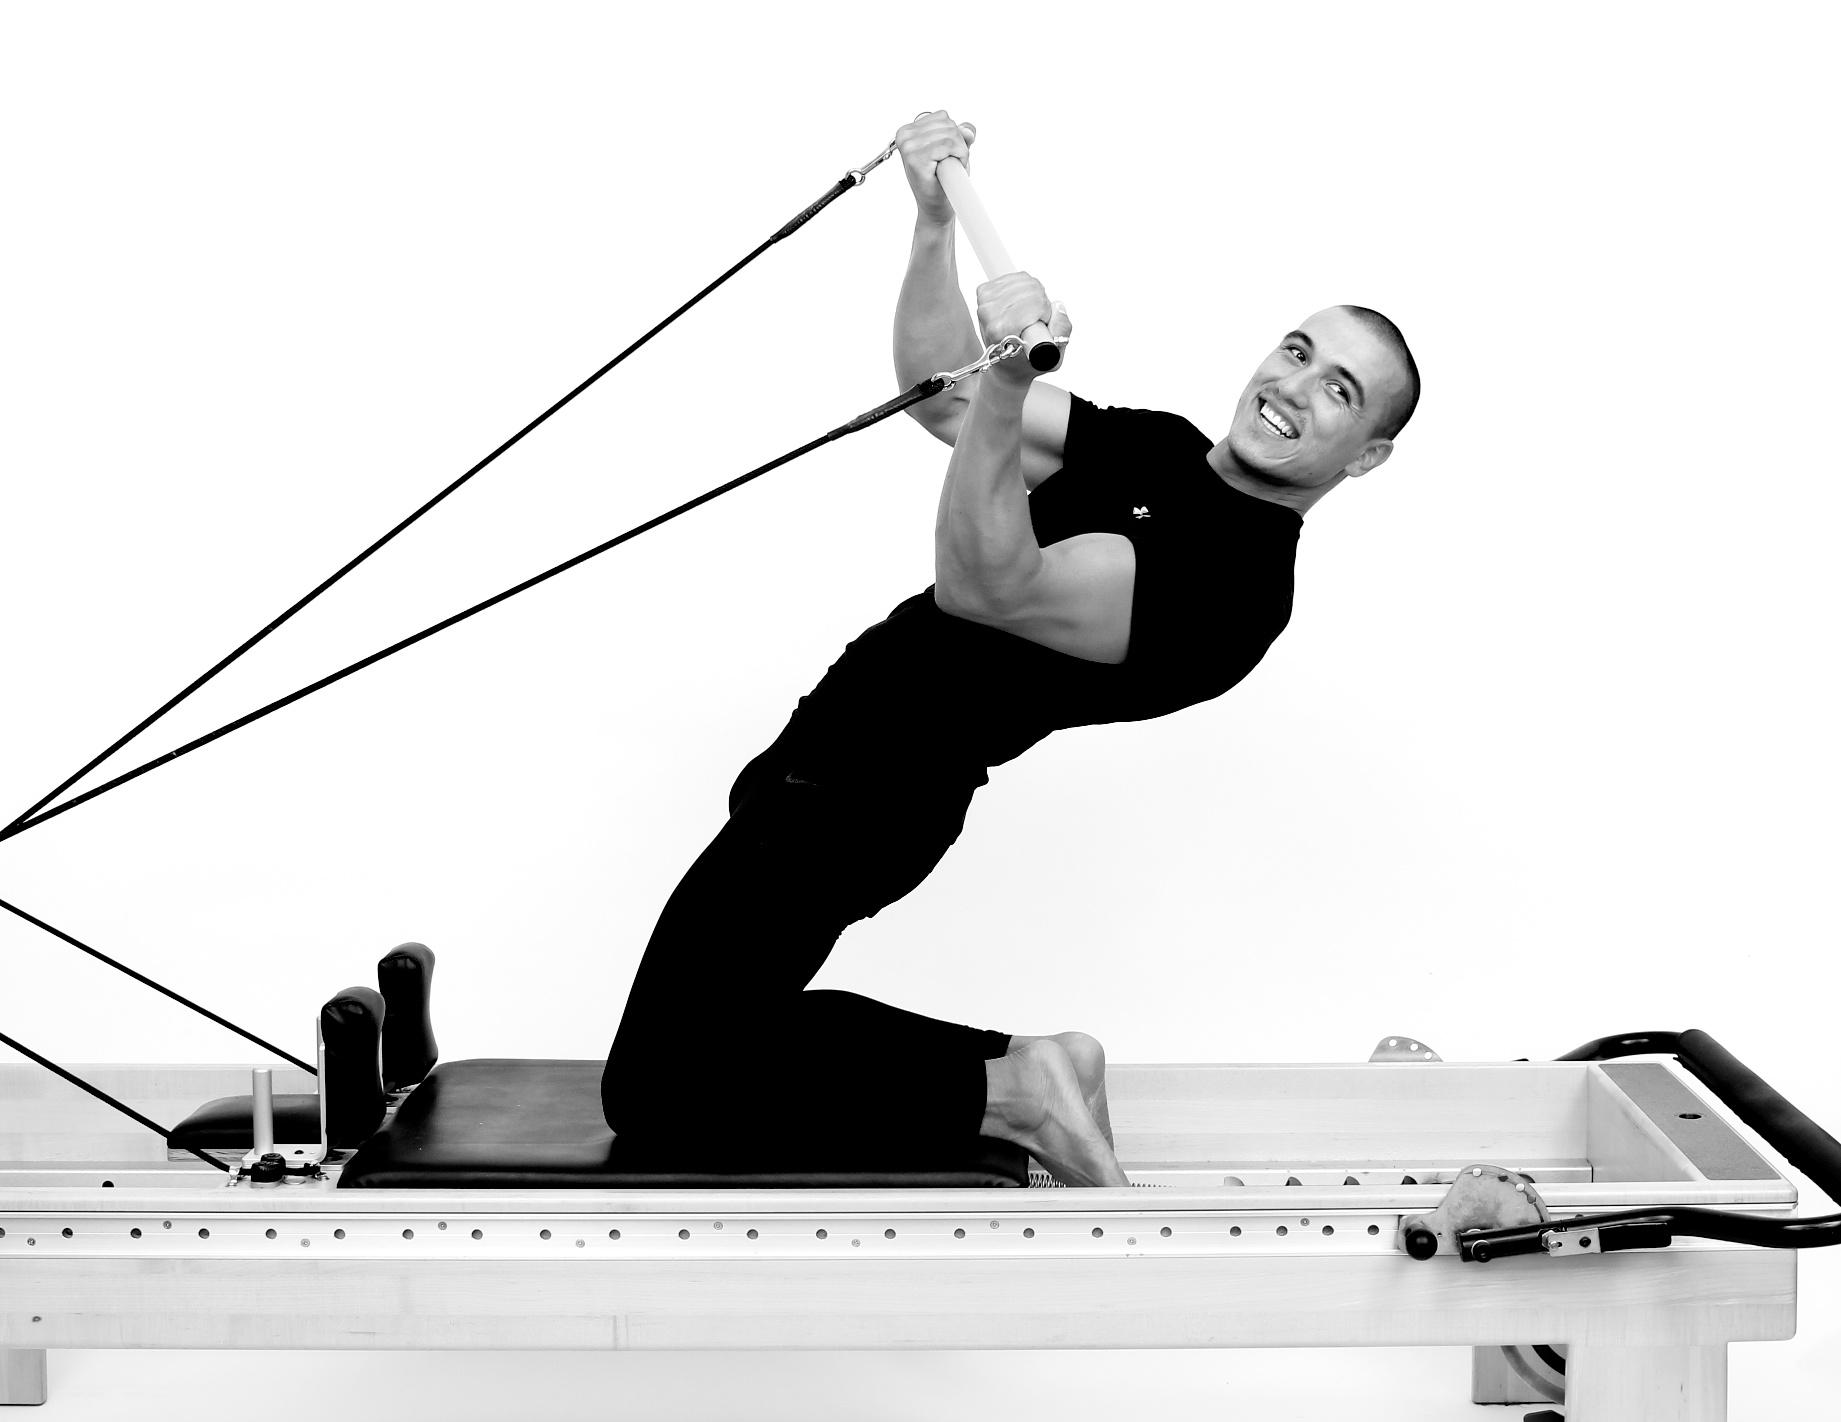 taube pilates thigh stretch